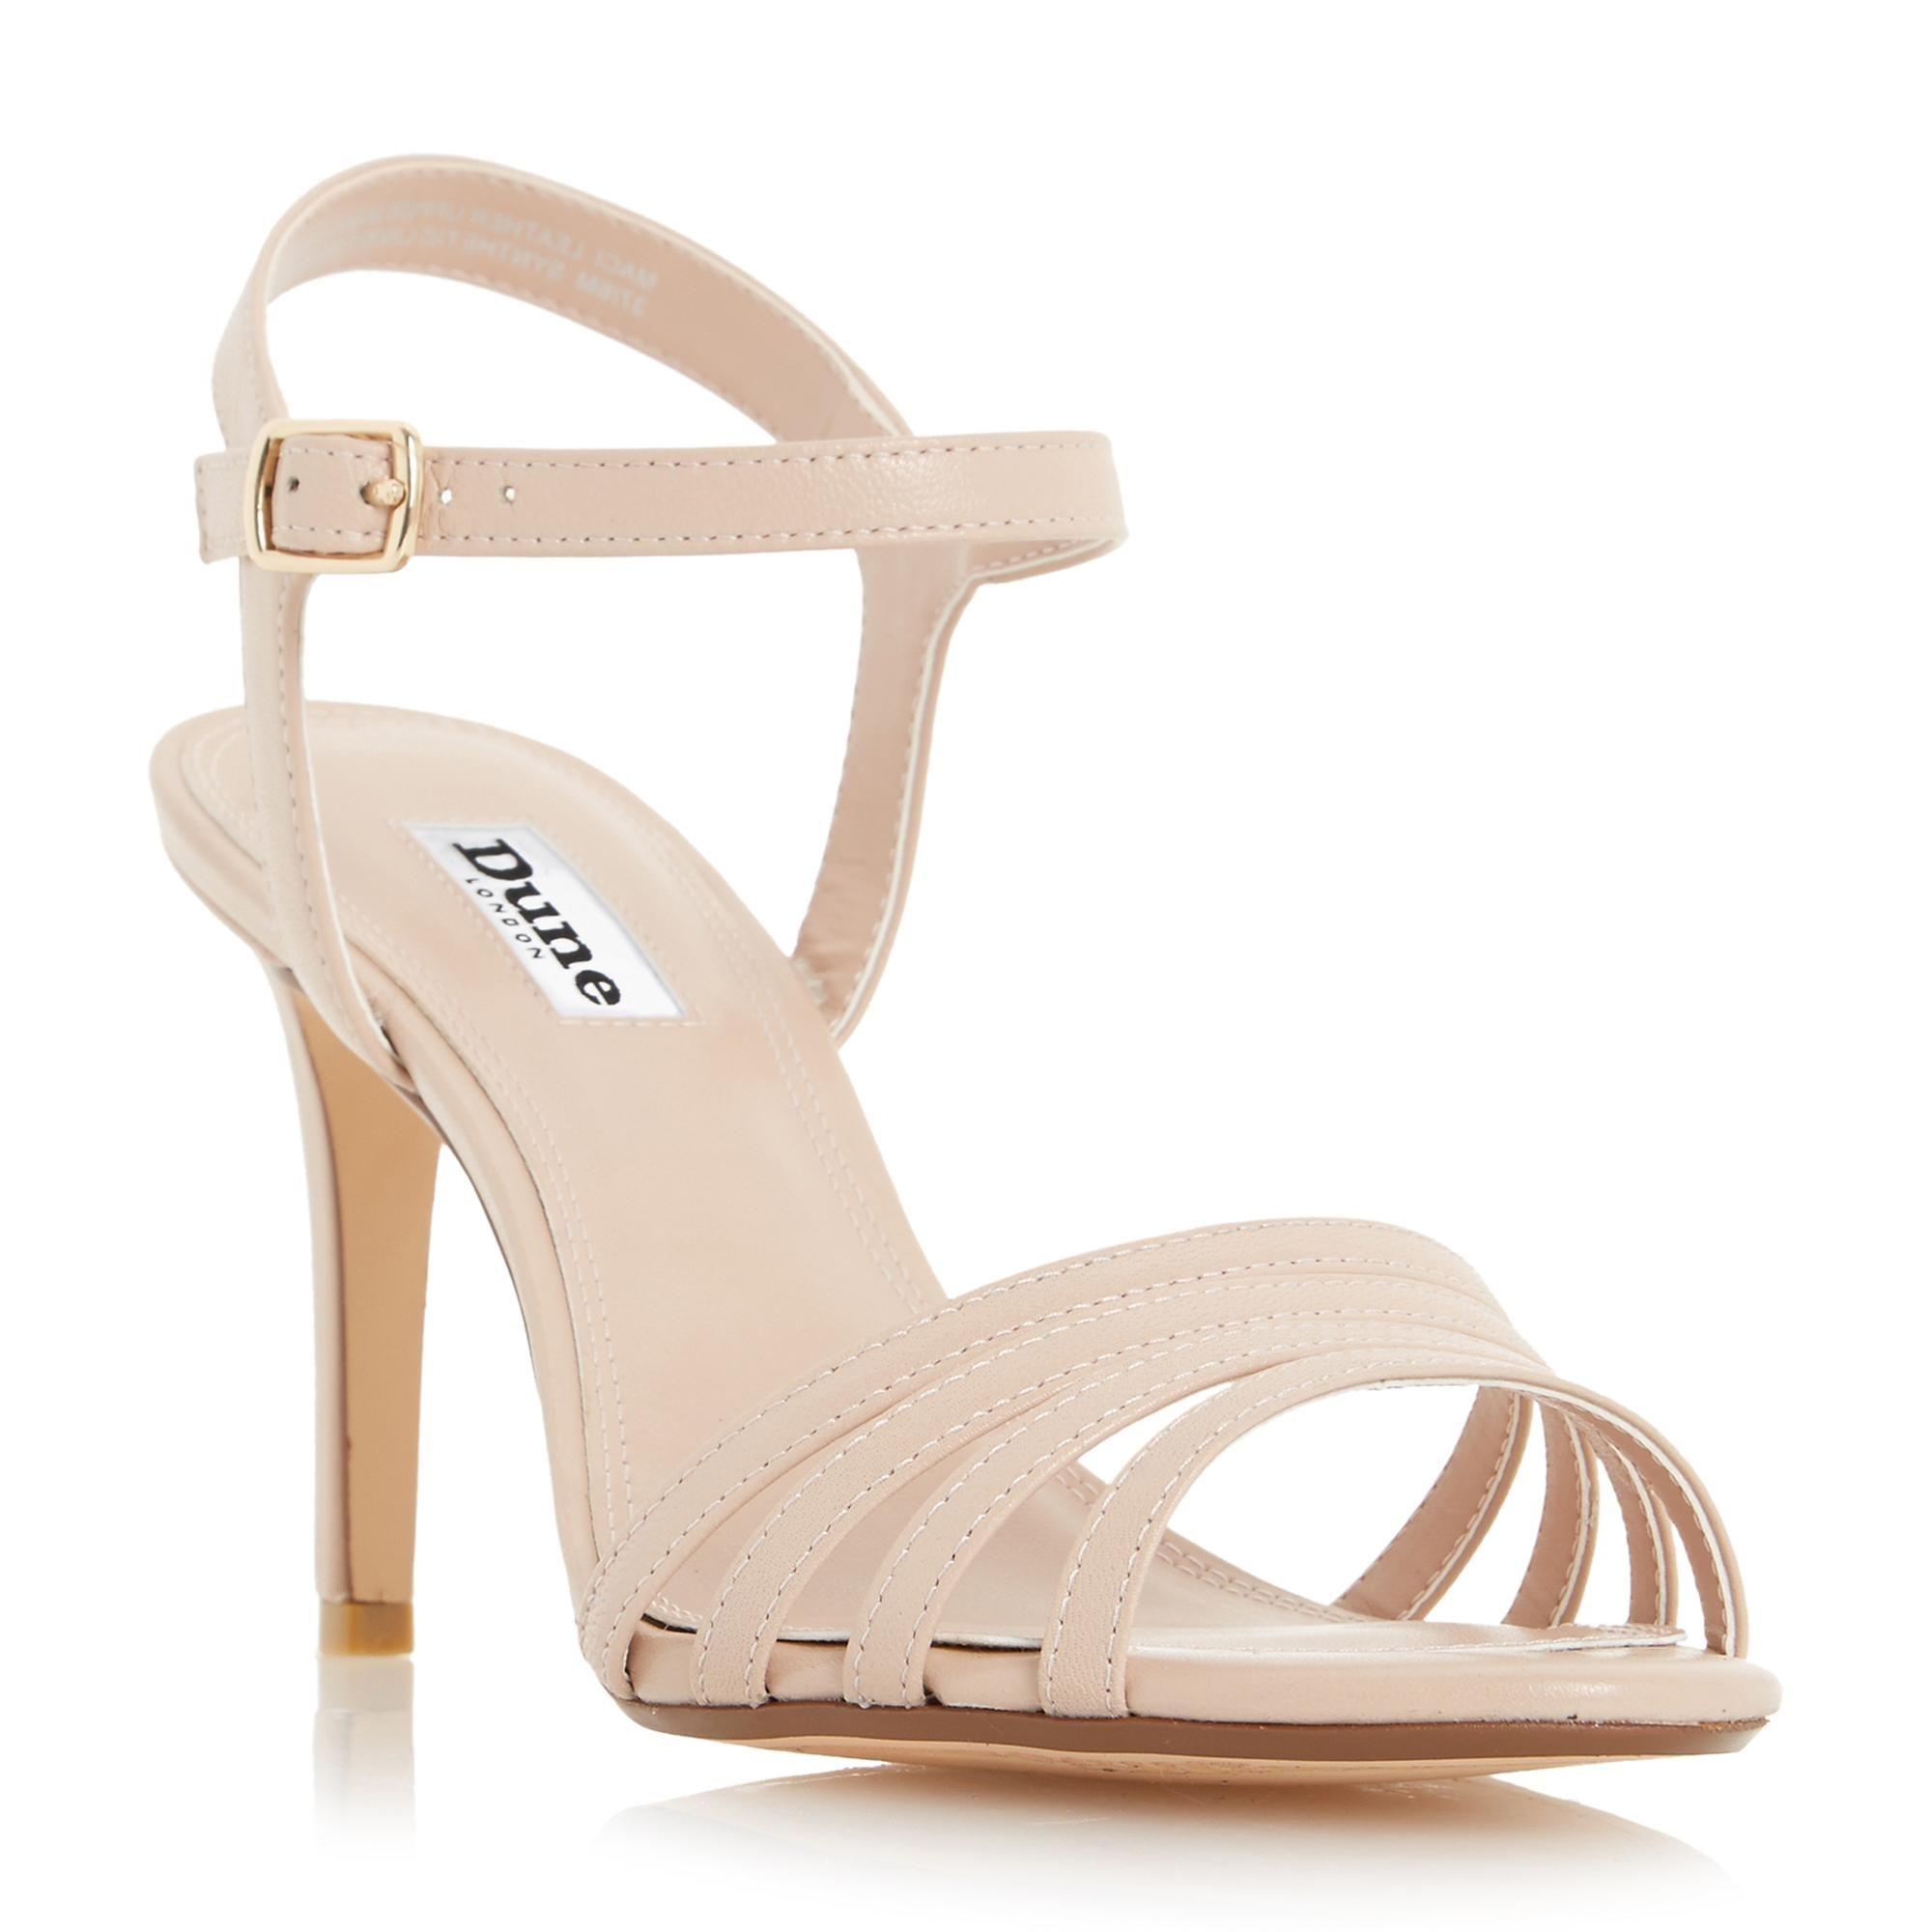 DUNE LADIES MACI - Strappy Two Part Mid Heel Sandal - nude | Dune ...